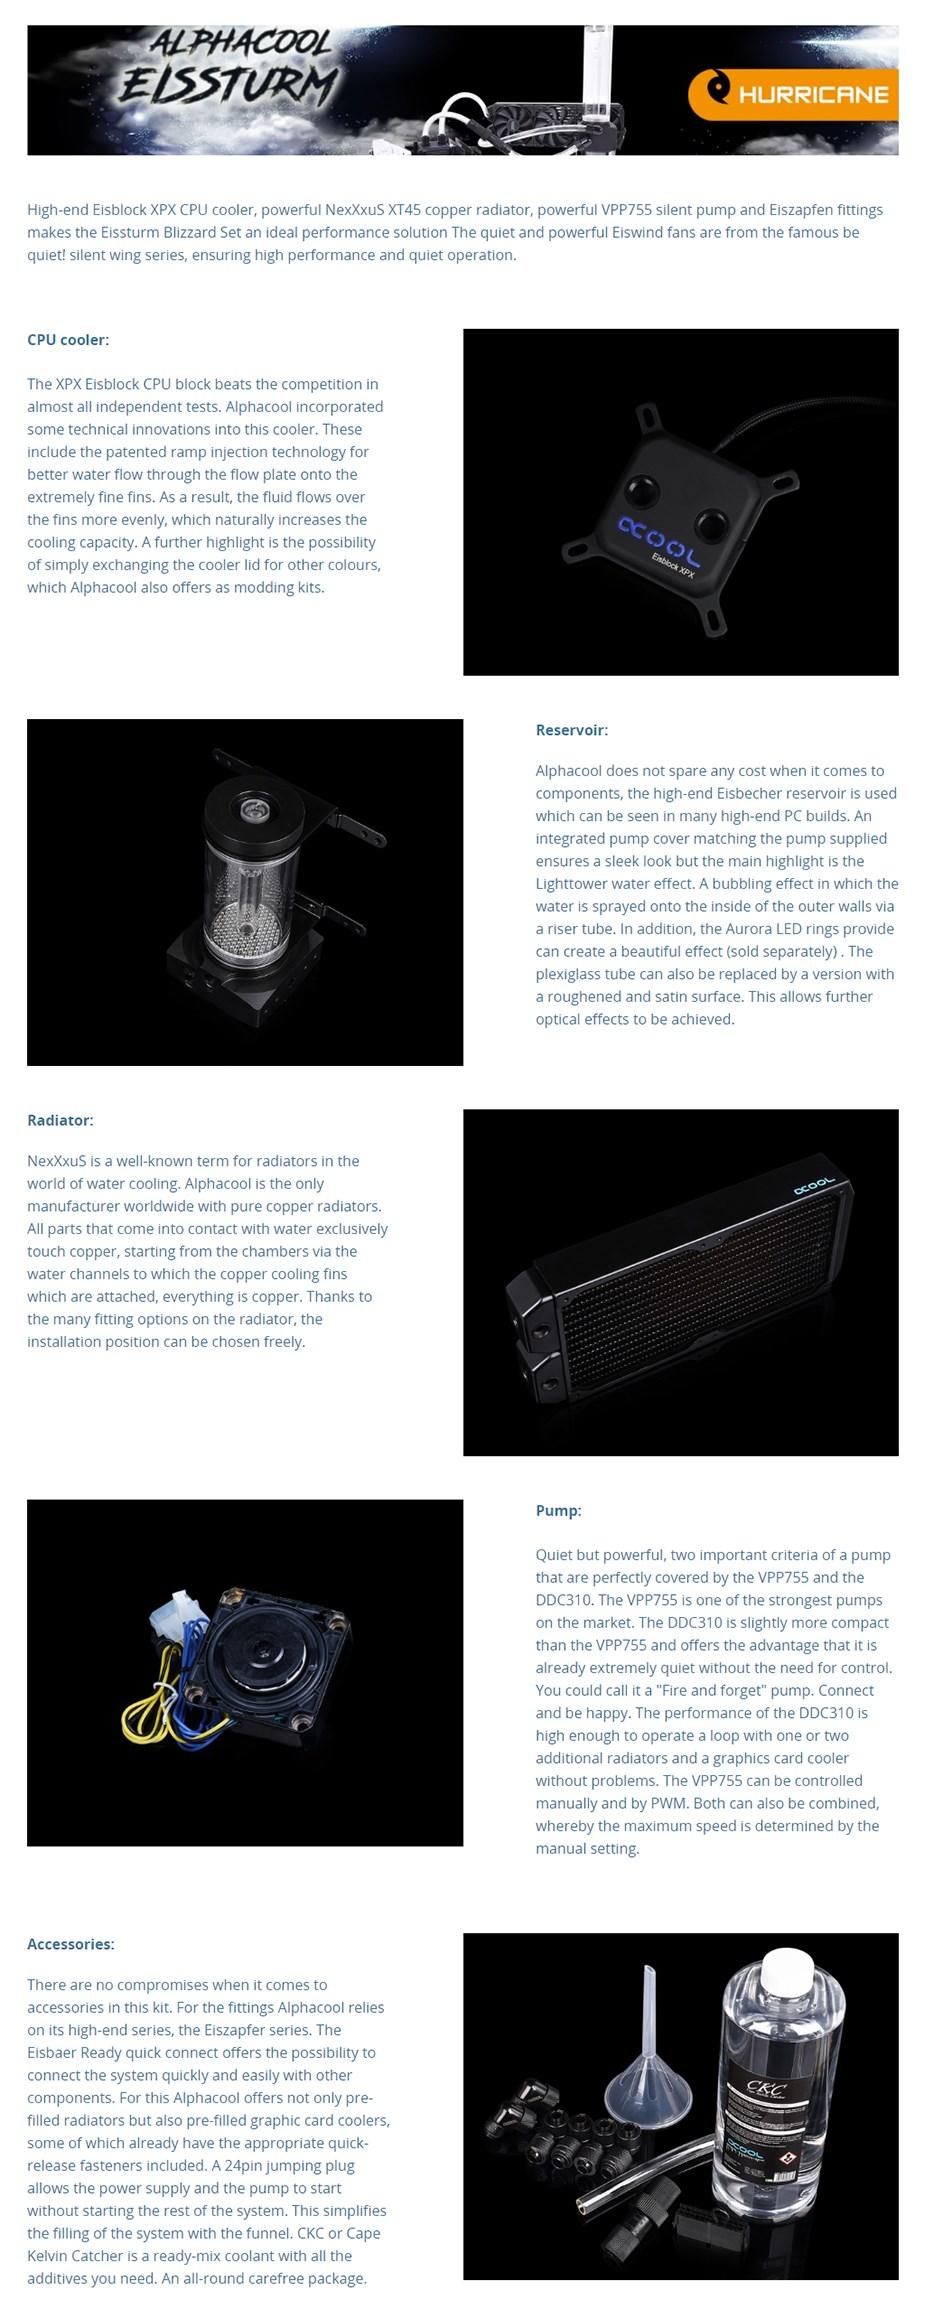 Alphacool Eissturm Hurricane Copper 45 2x120mm Watercooling Kit - Desktop Overview 1